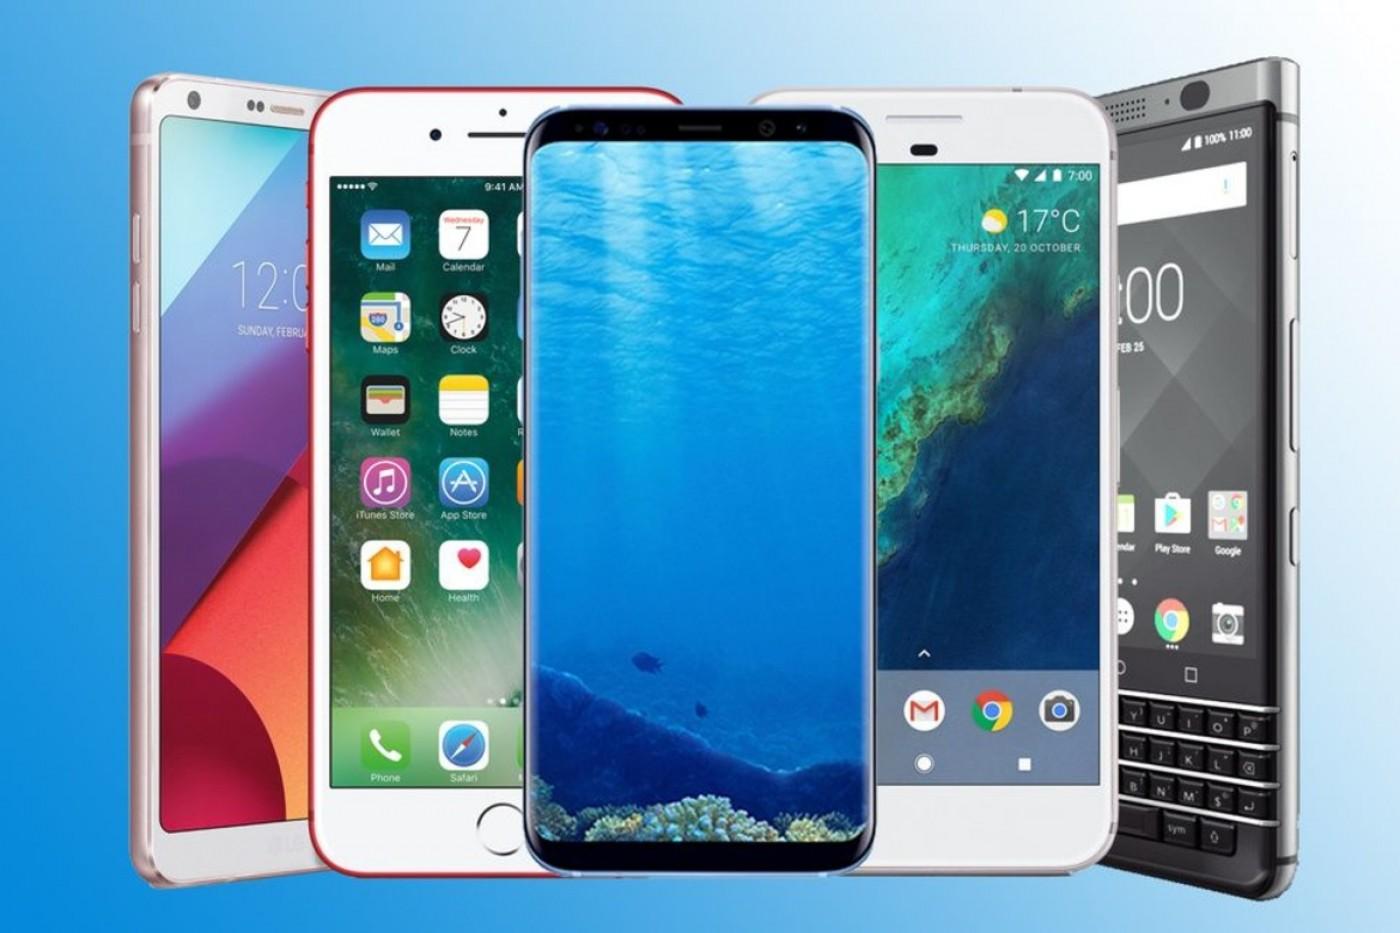 چگونه تلفن همراه خاموش را پیدا کنیم؟